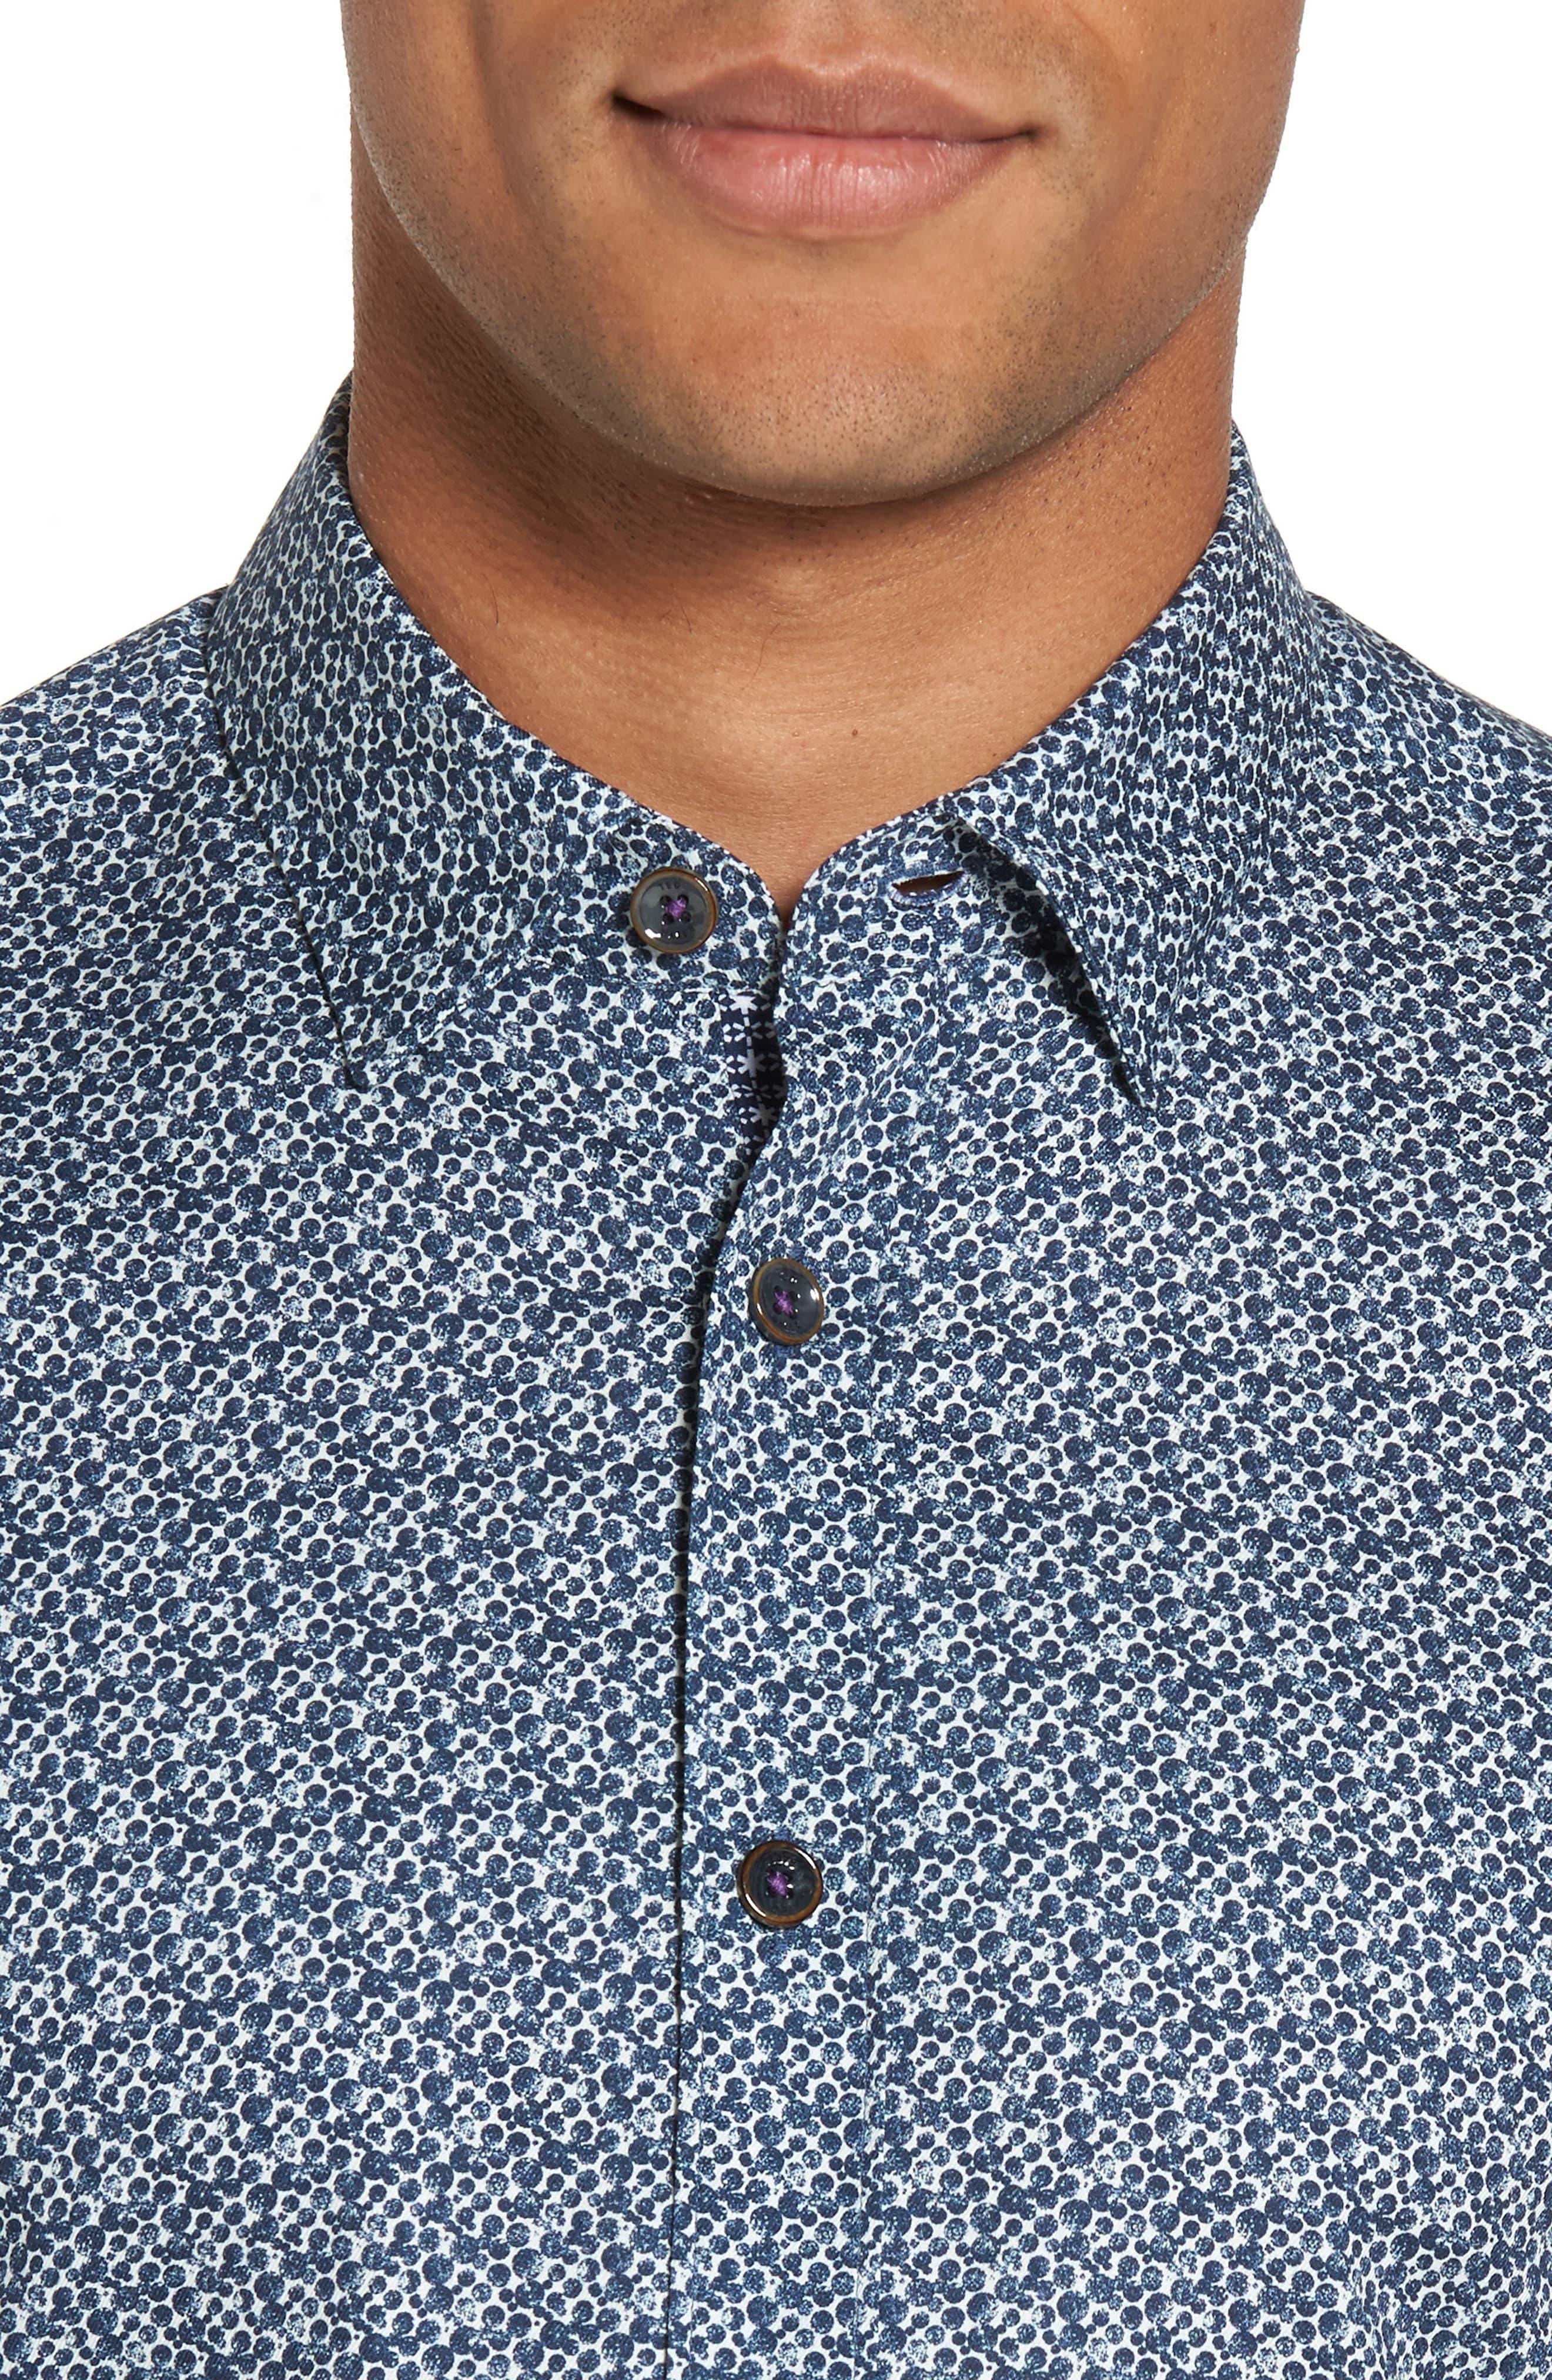 Bubbly Extra Slim Fit Print Sport Shirt,                             Alternate thumbnail 4, color,                             410